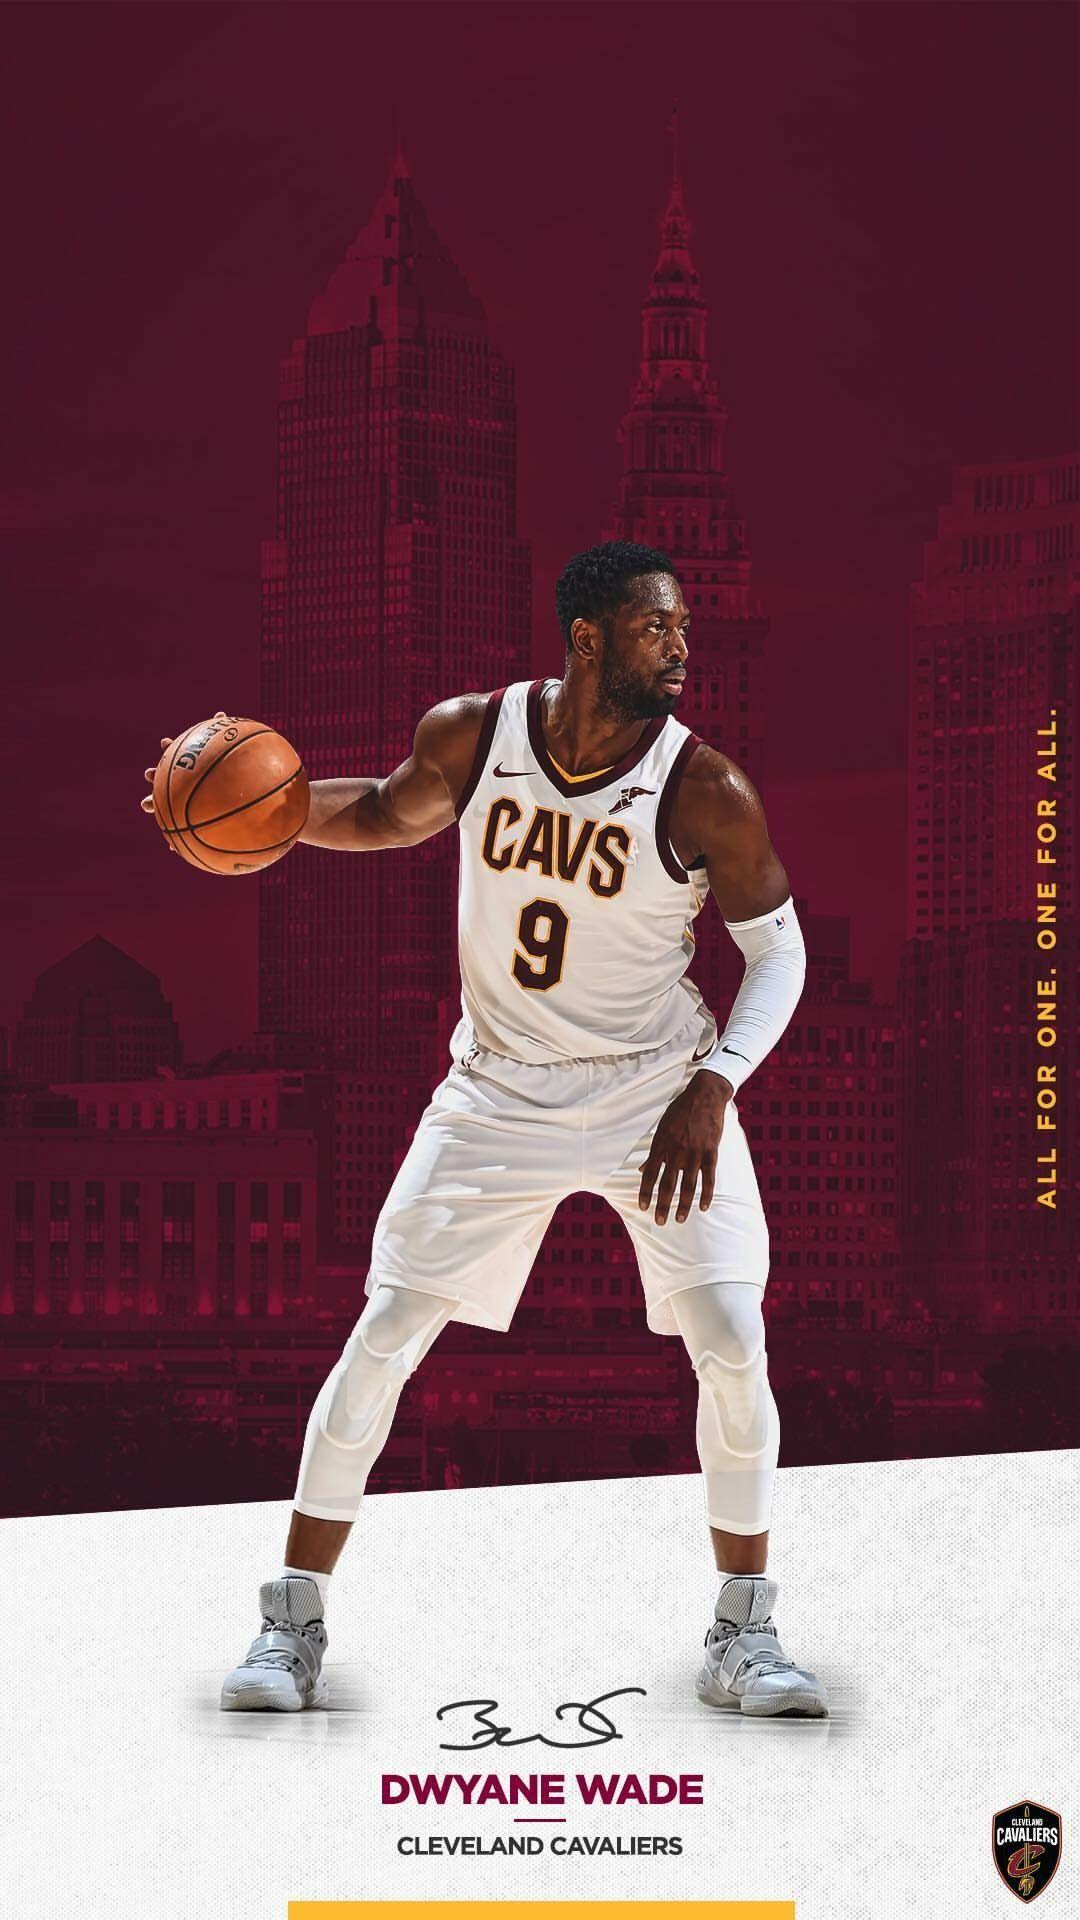 Dwayne Wade Wallpaper Basketball Leagues Basketball Legends Dwyane Wade